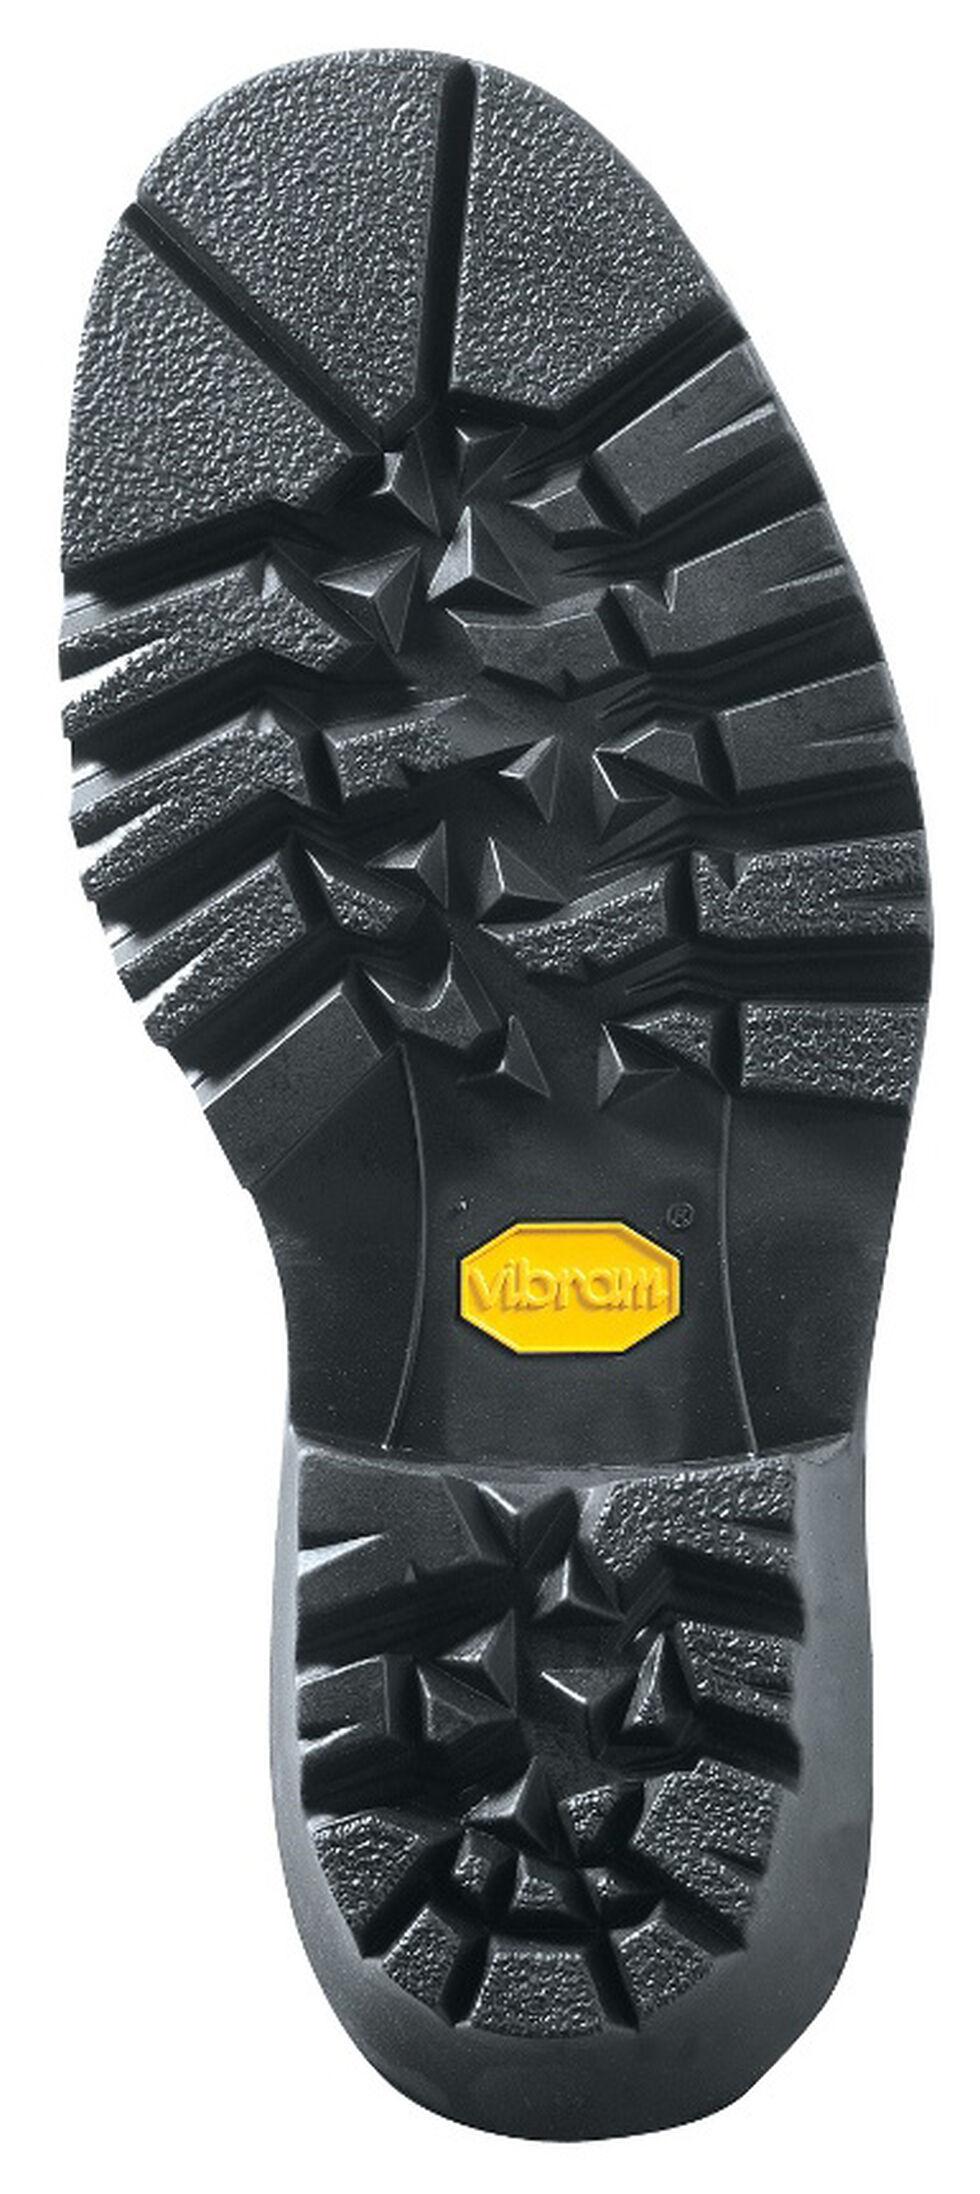 "Chippewa Insulated Waterproof Super Logger 9"" Work Boots - Steel Toe, Bay Apache, hi-res"